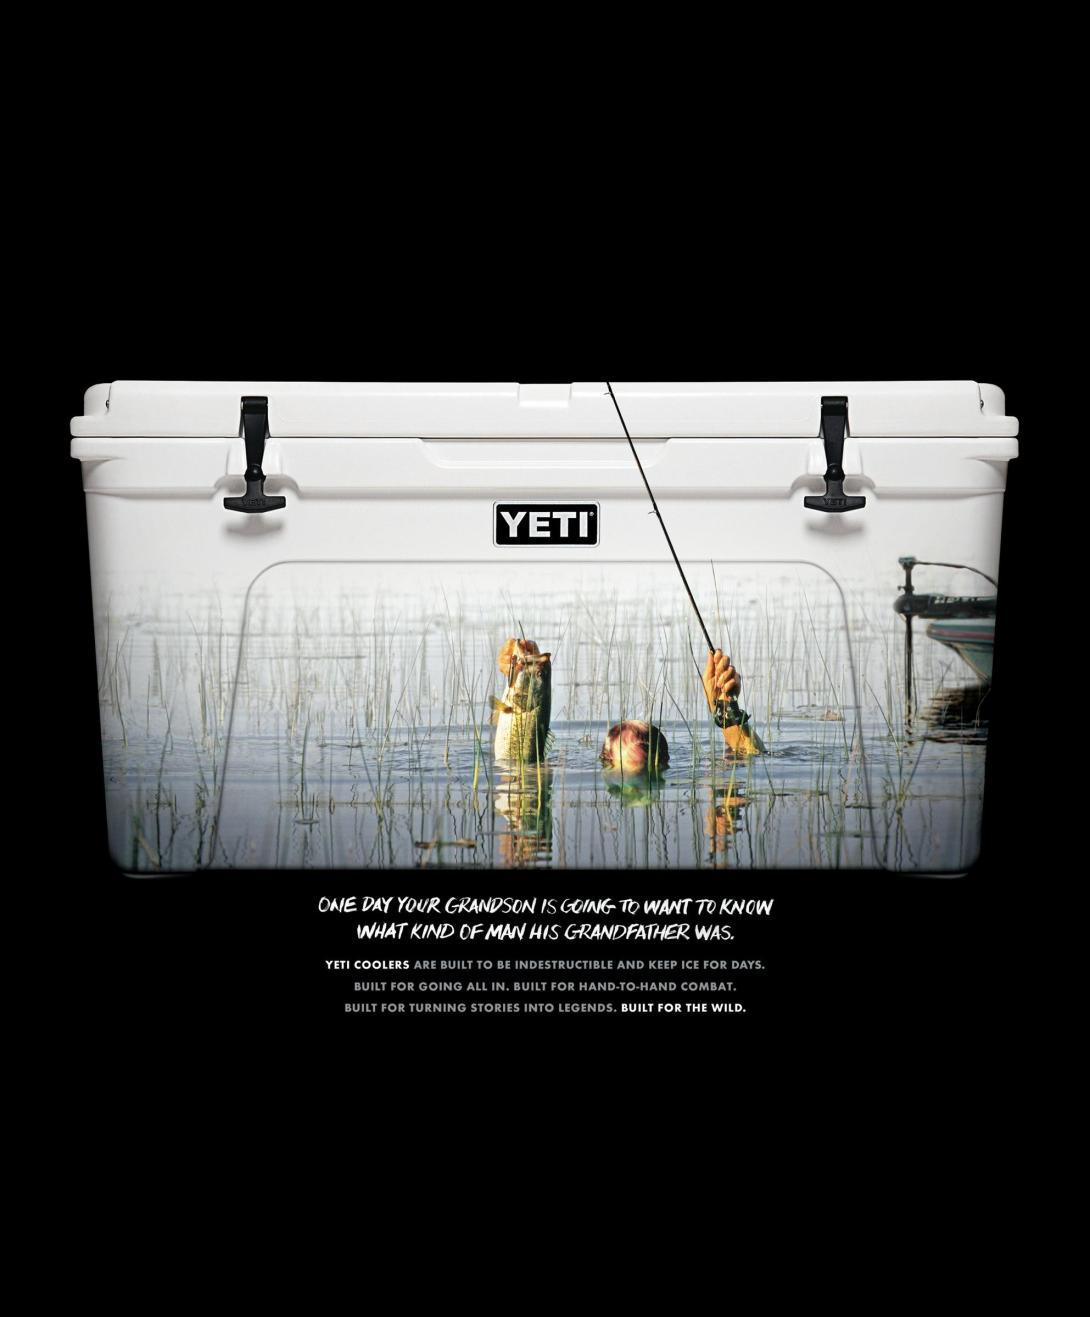 yeti_coolers_print-bass_aotw